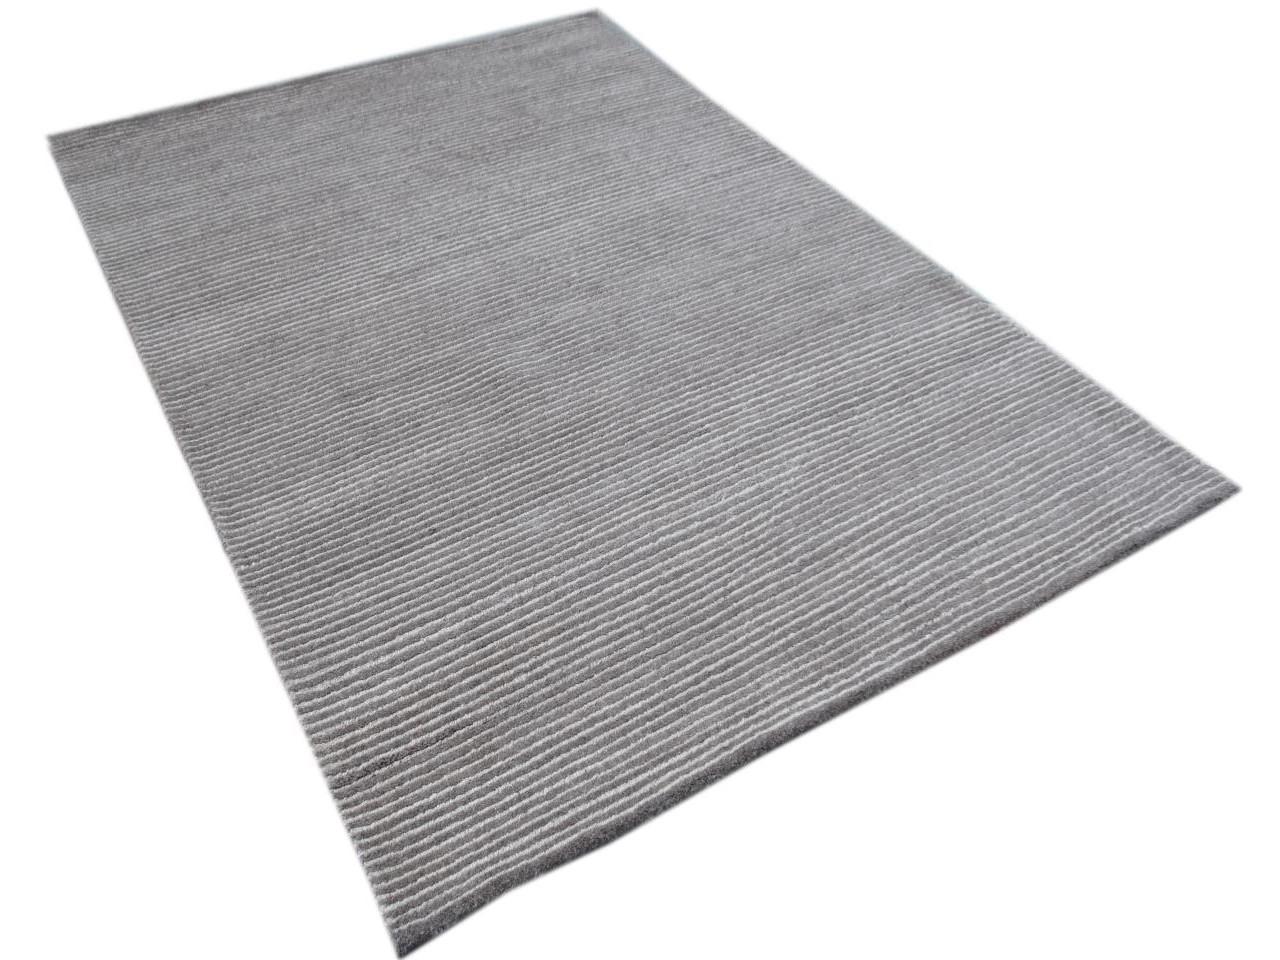 Chakia gris tapis design n 2151 300x200cm - Tapis 200x140 ...